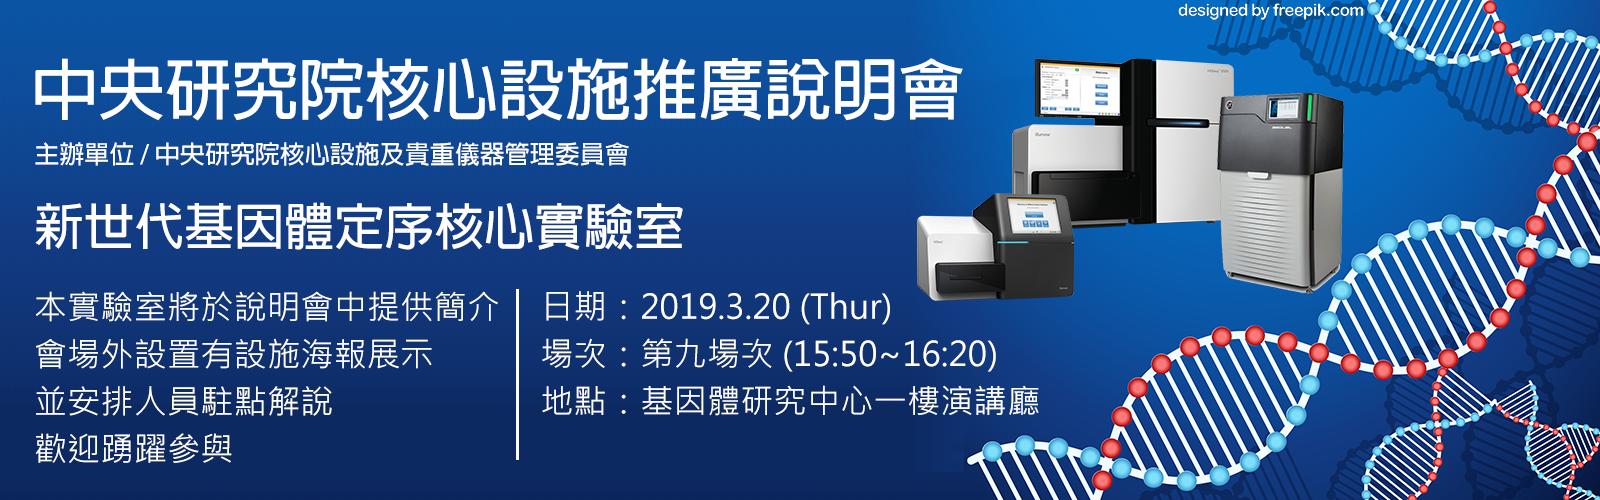 20190320 Core Facilities Workshop